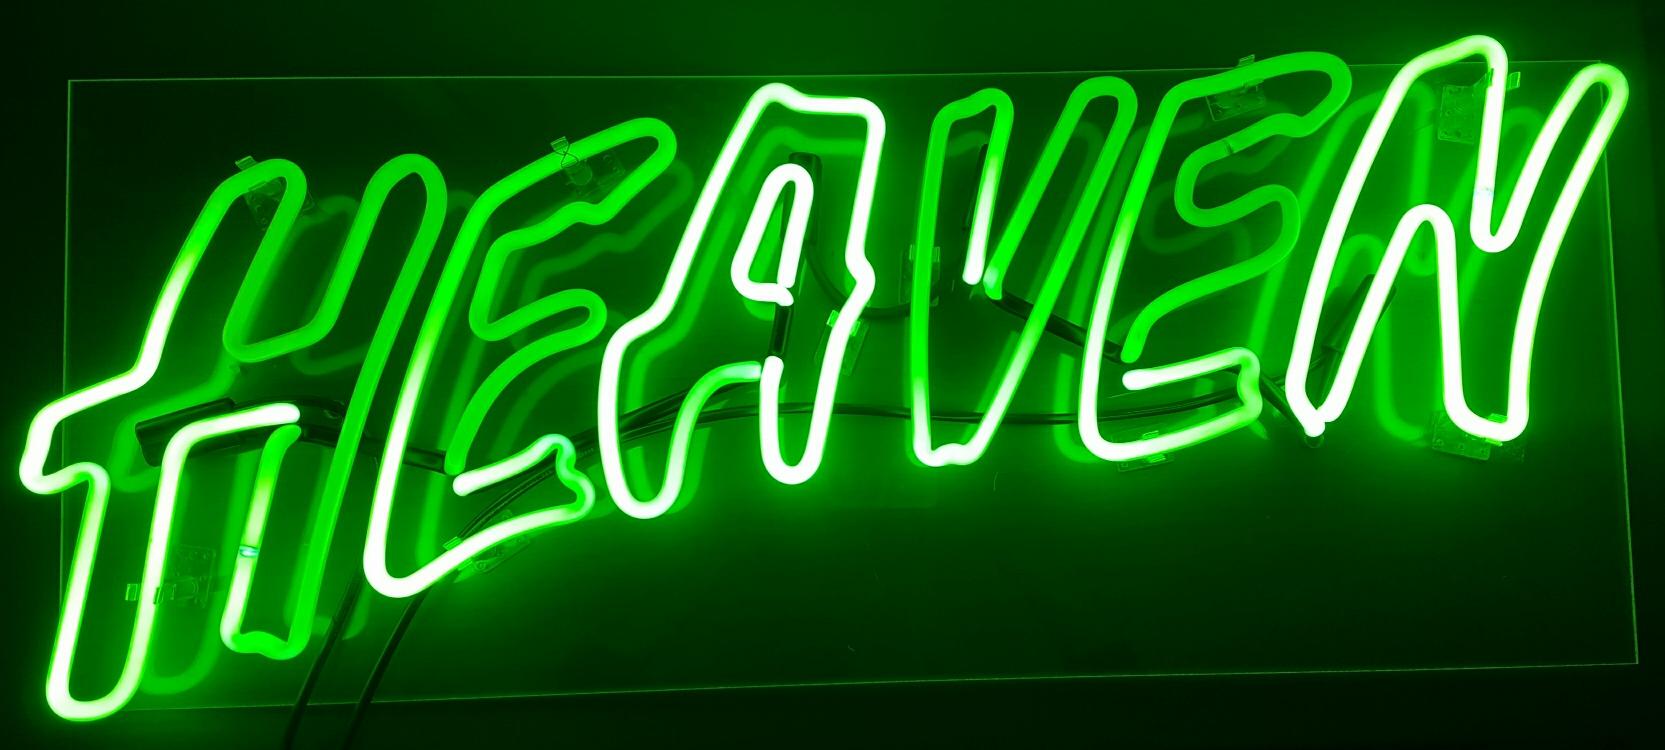 NeonVeepGreenYellowglass.jpg